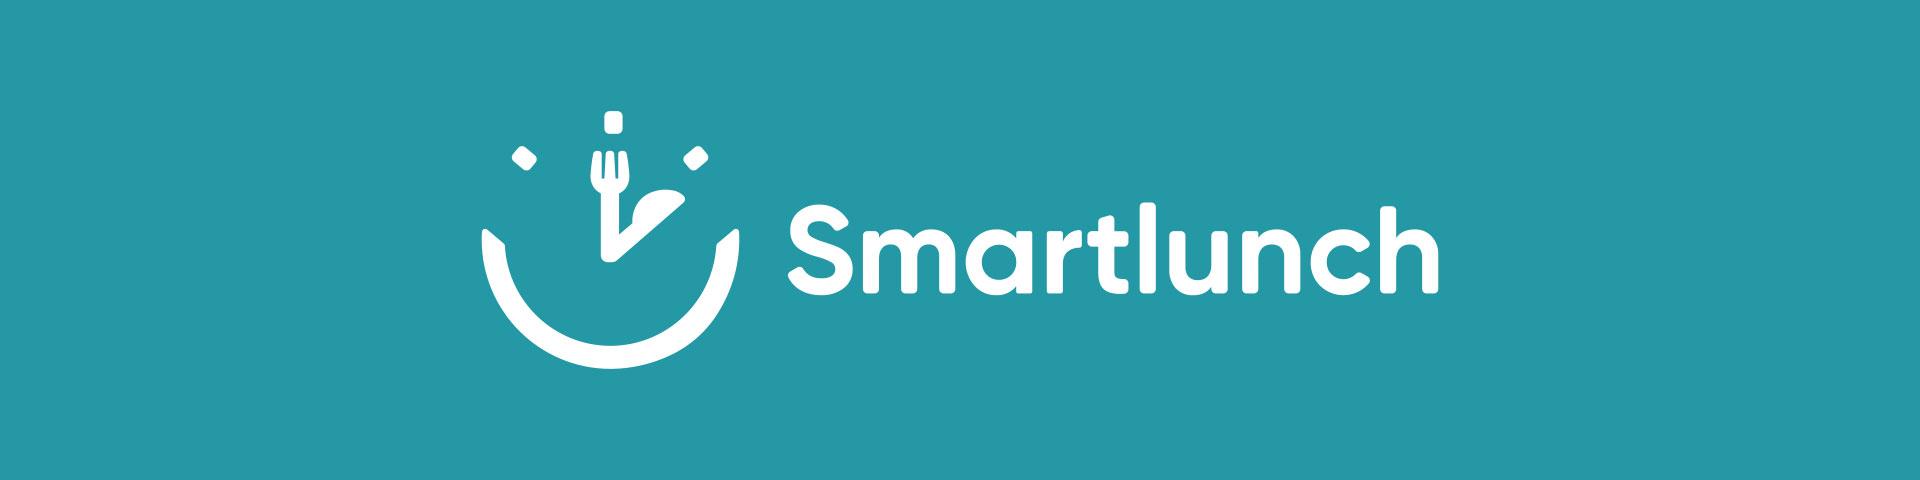 post smartlunch 1